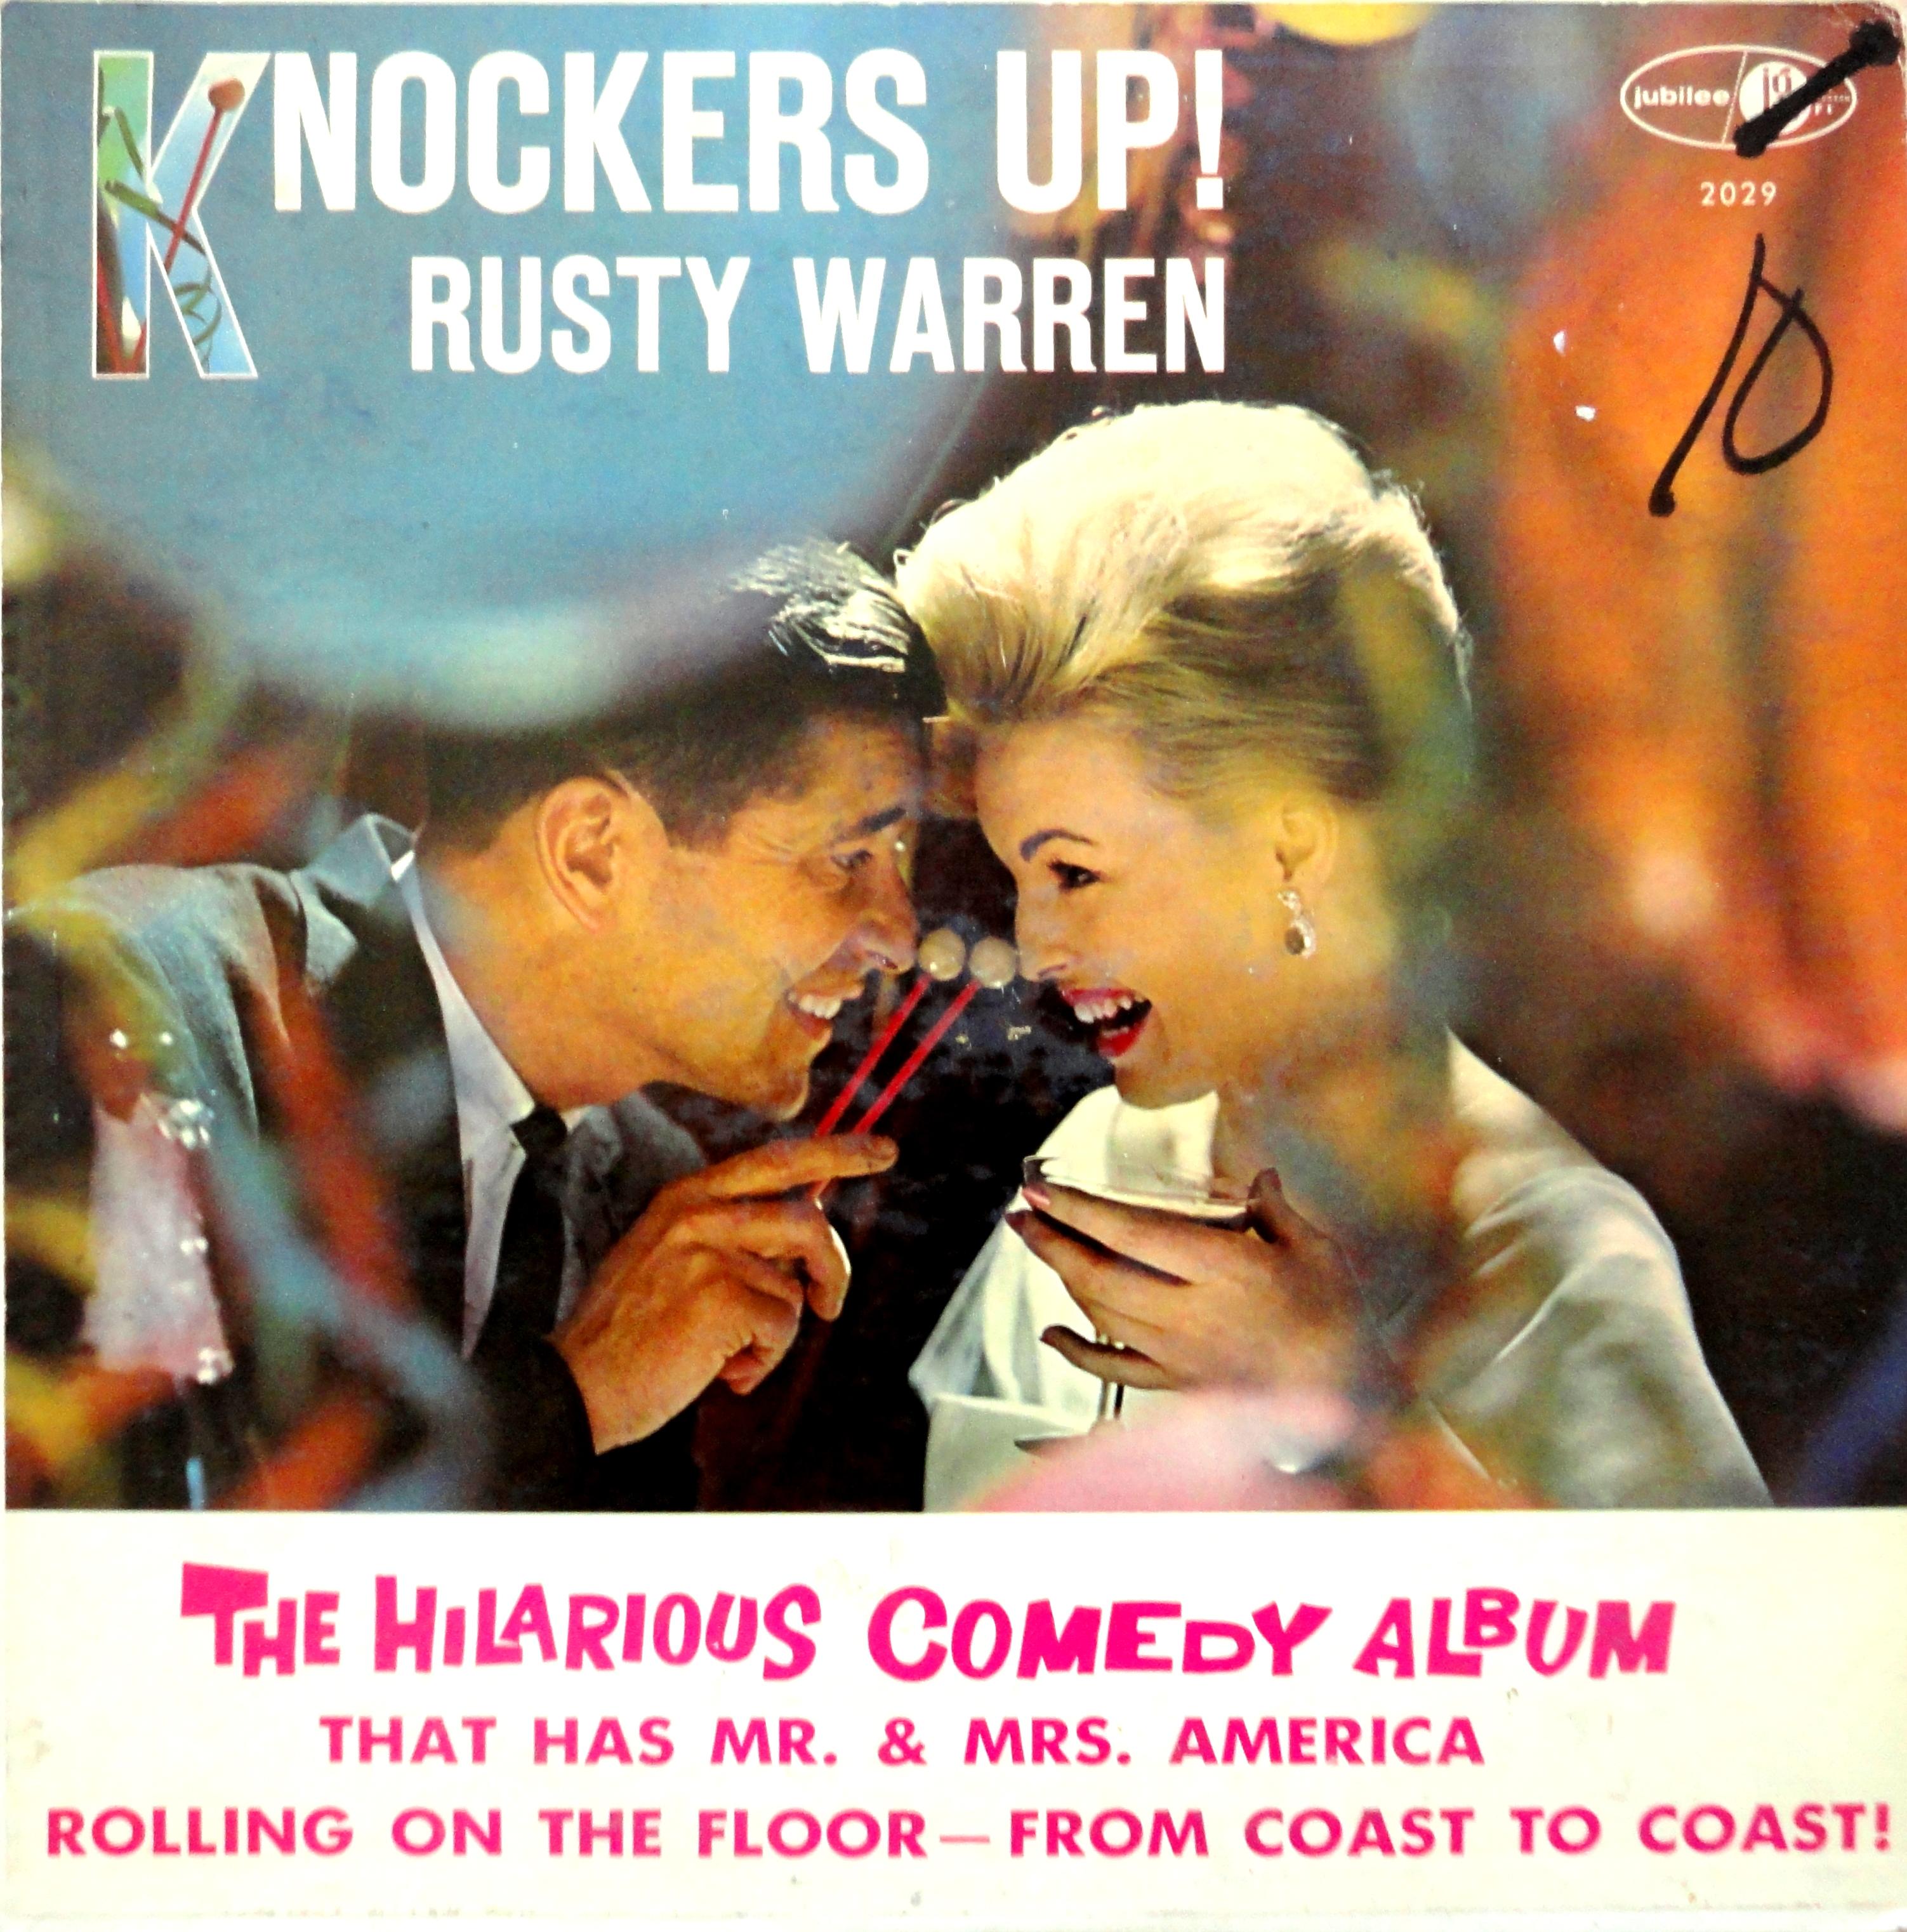 Rusty Warren - Knockers Up!